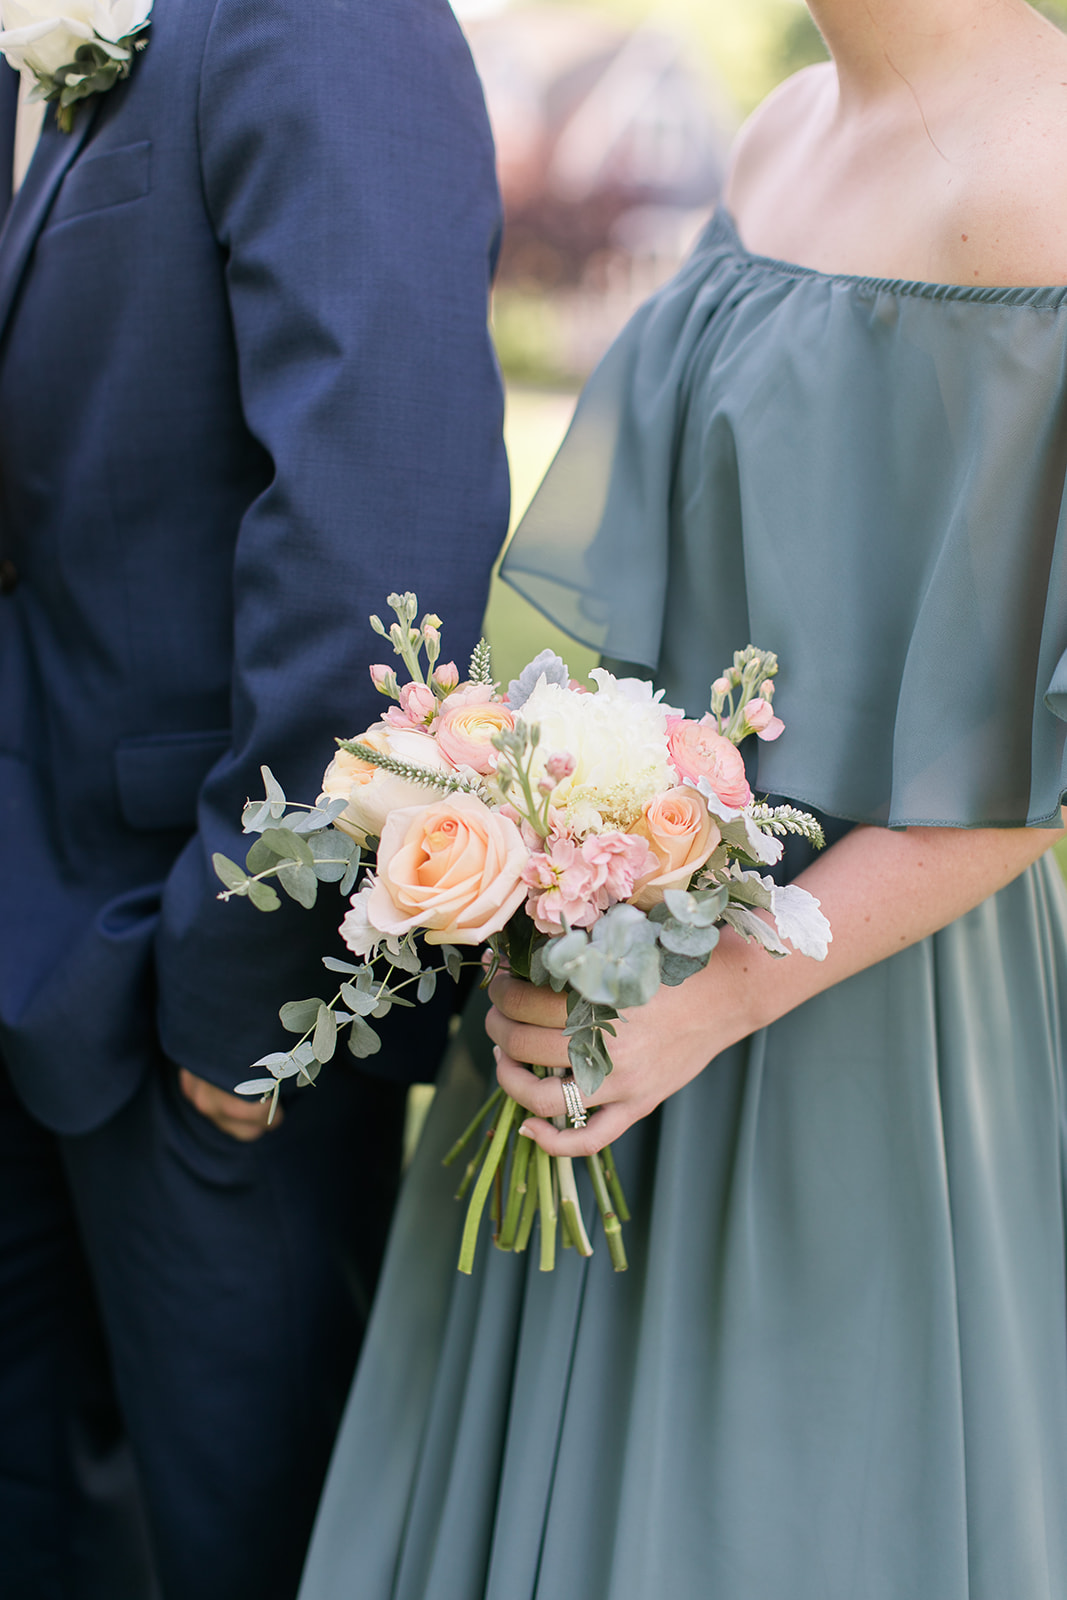 Abbey-Colby-wedding-57_websize.jpg